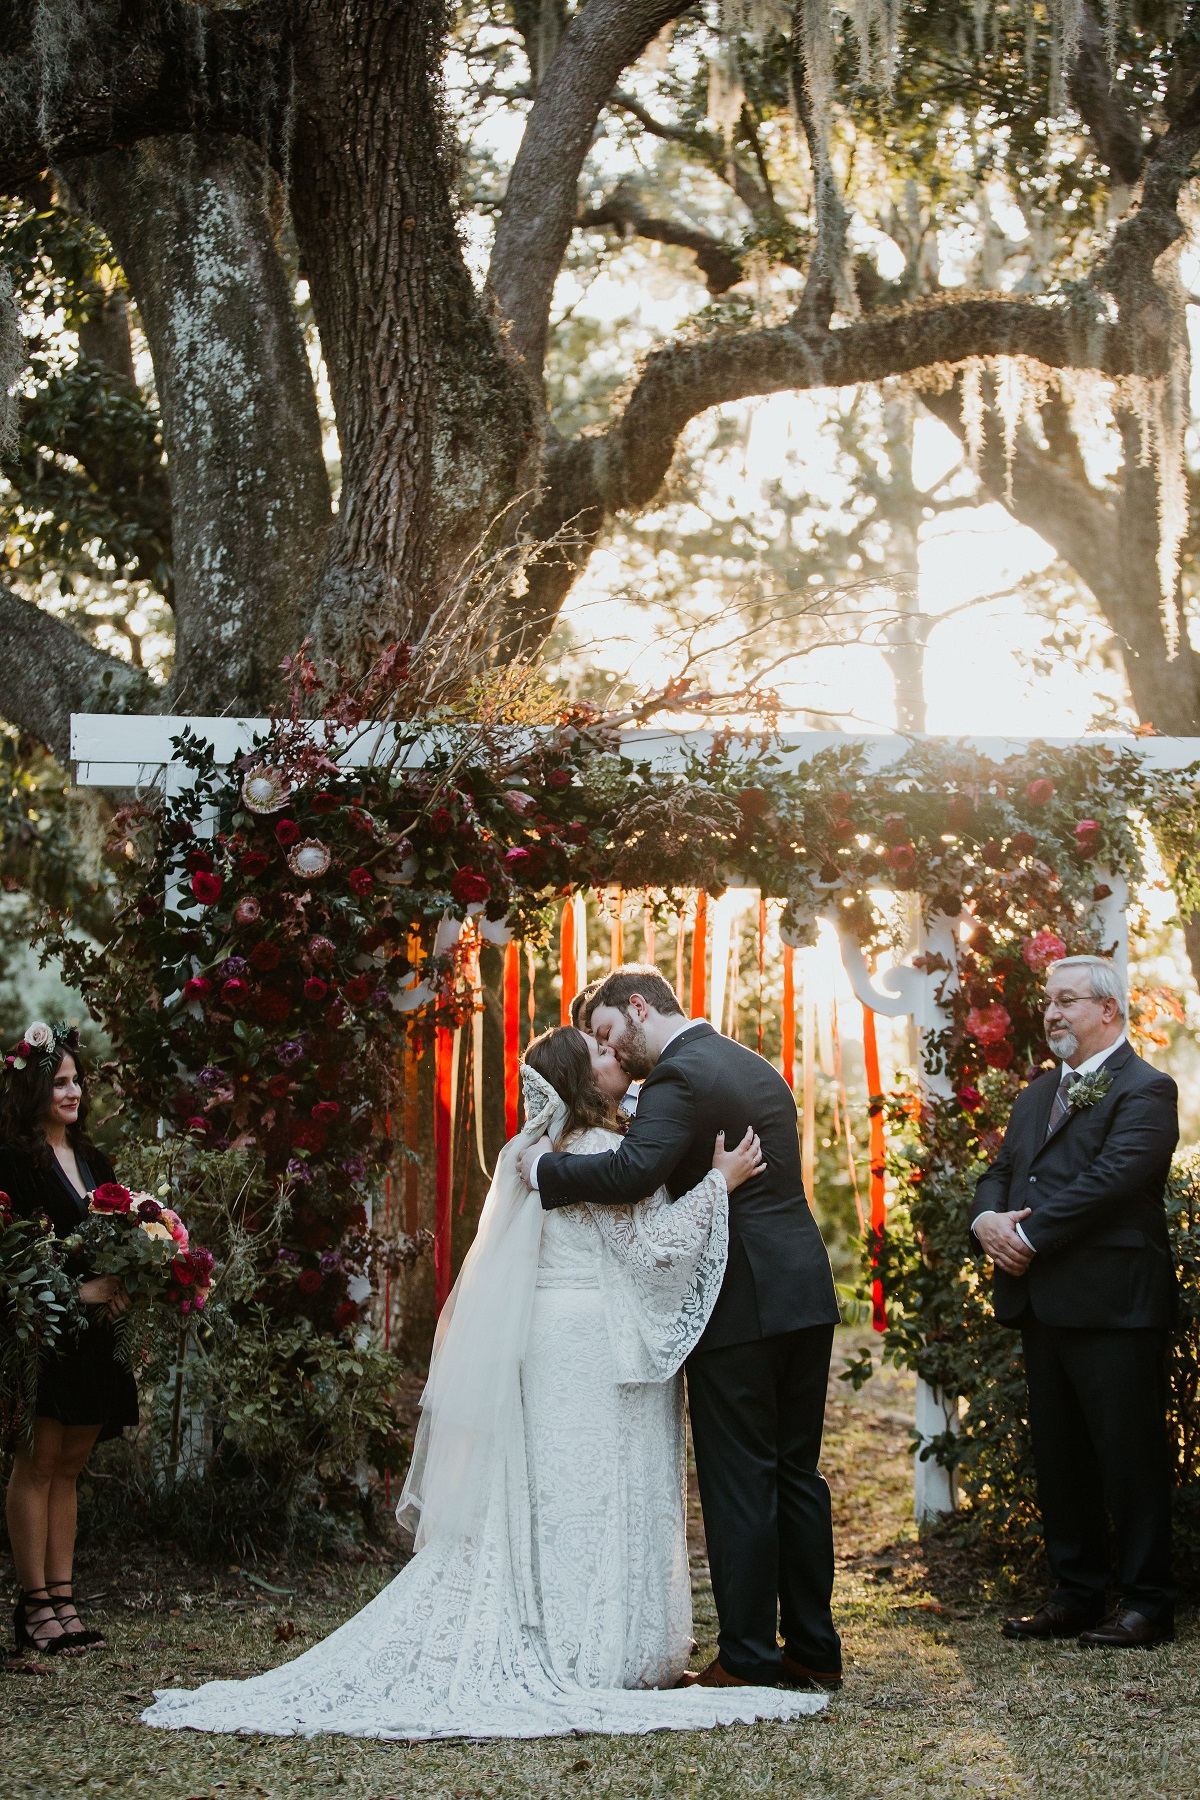 legare-waring-house-wedding-44.jpg